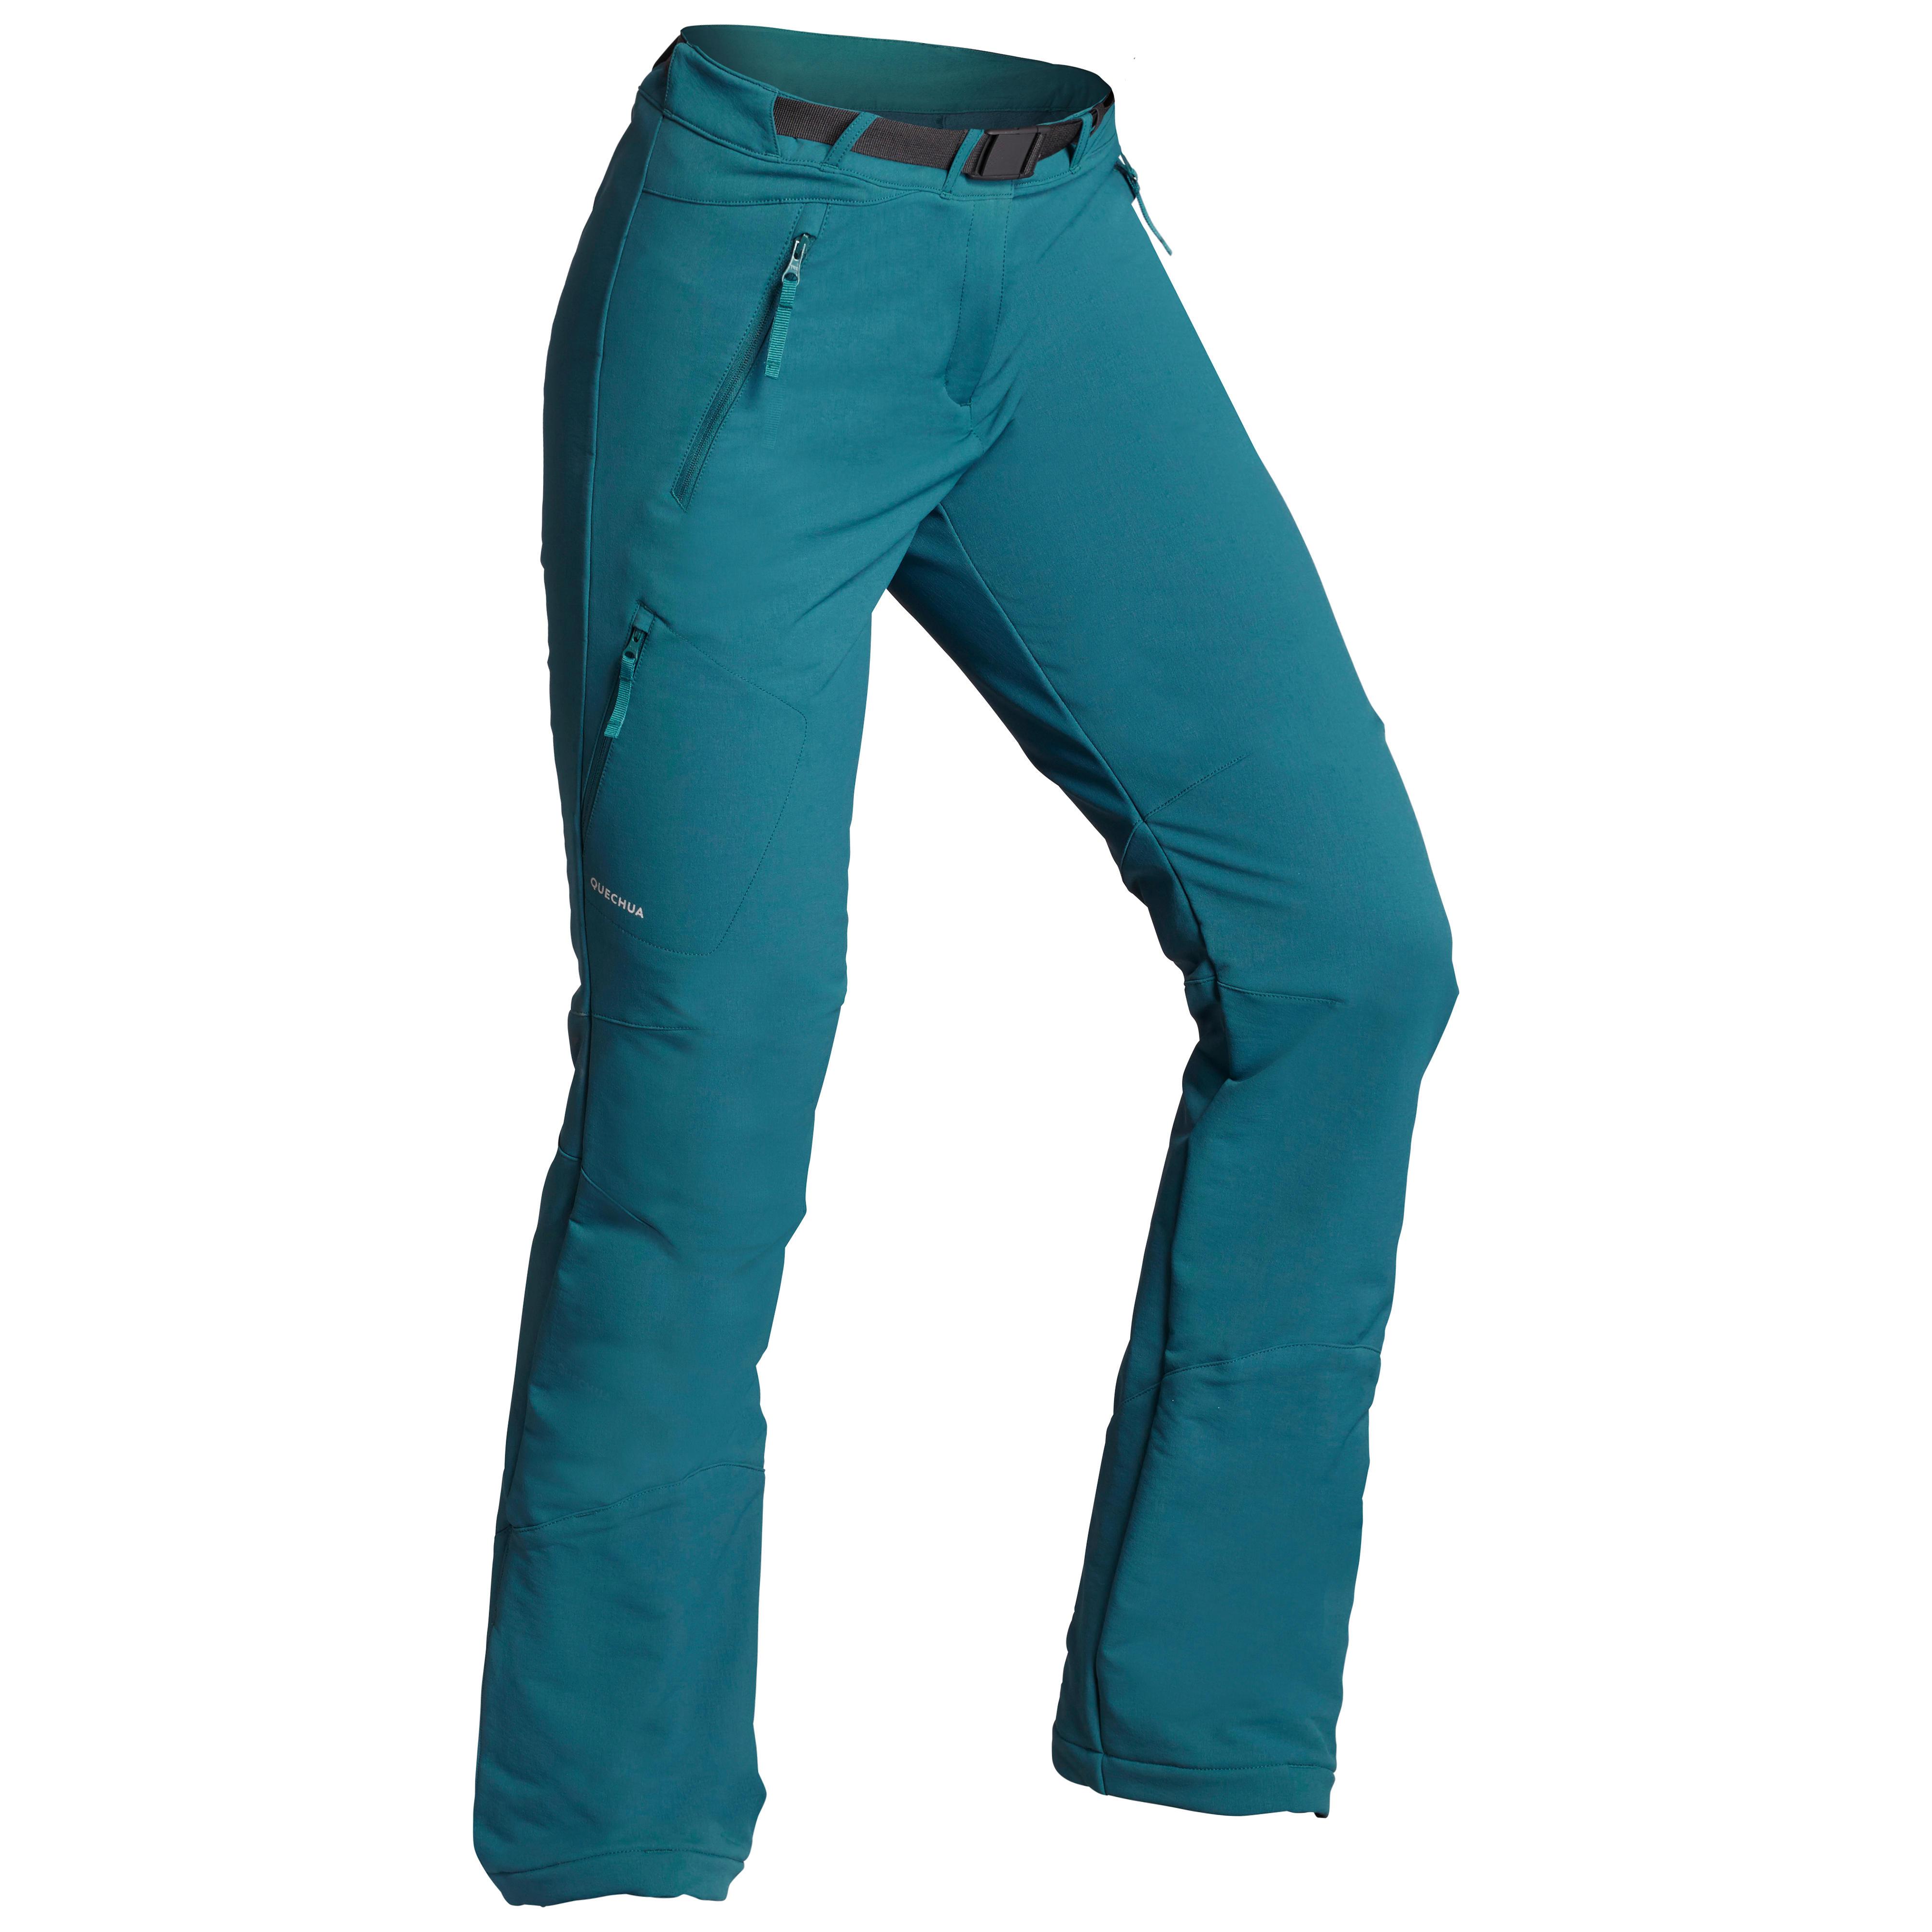 Pantalon SH500 X-WARM Damă imagine produs